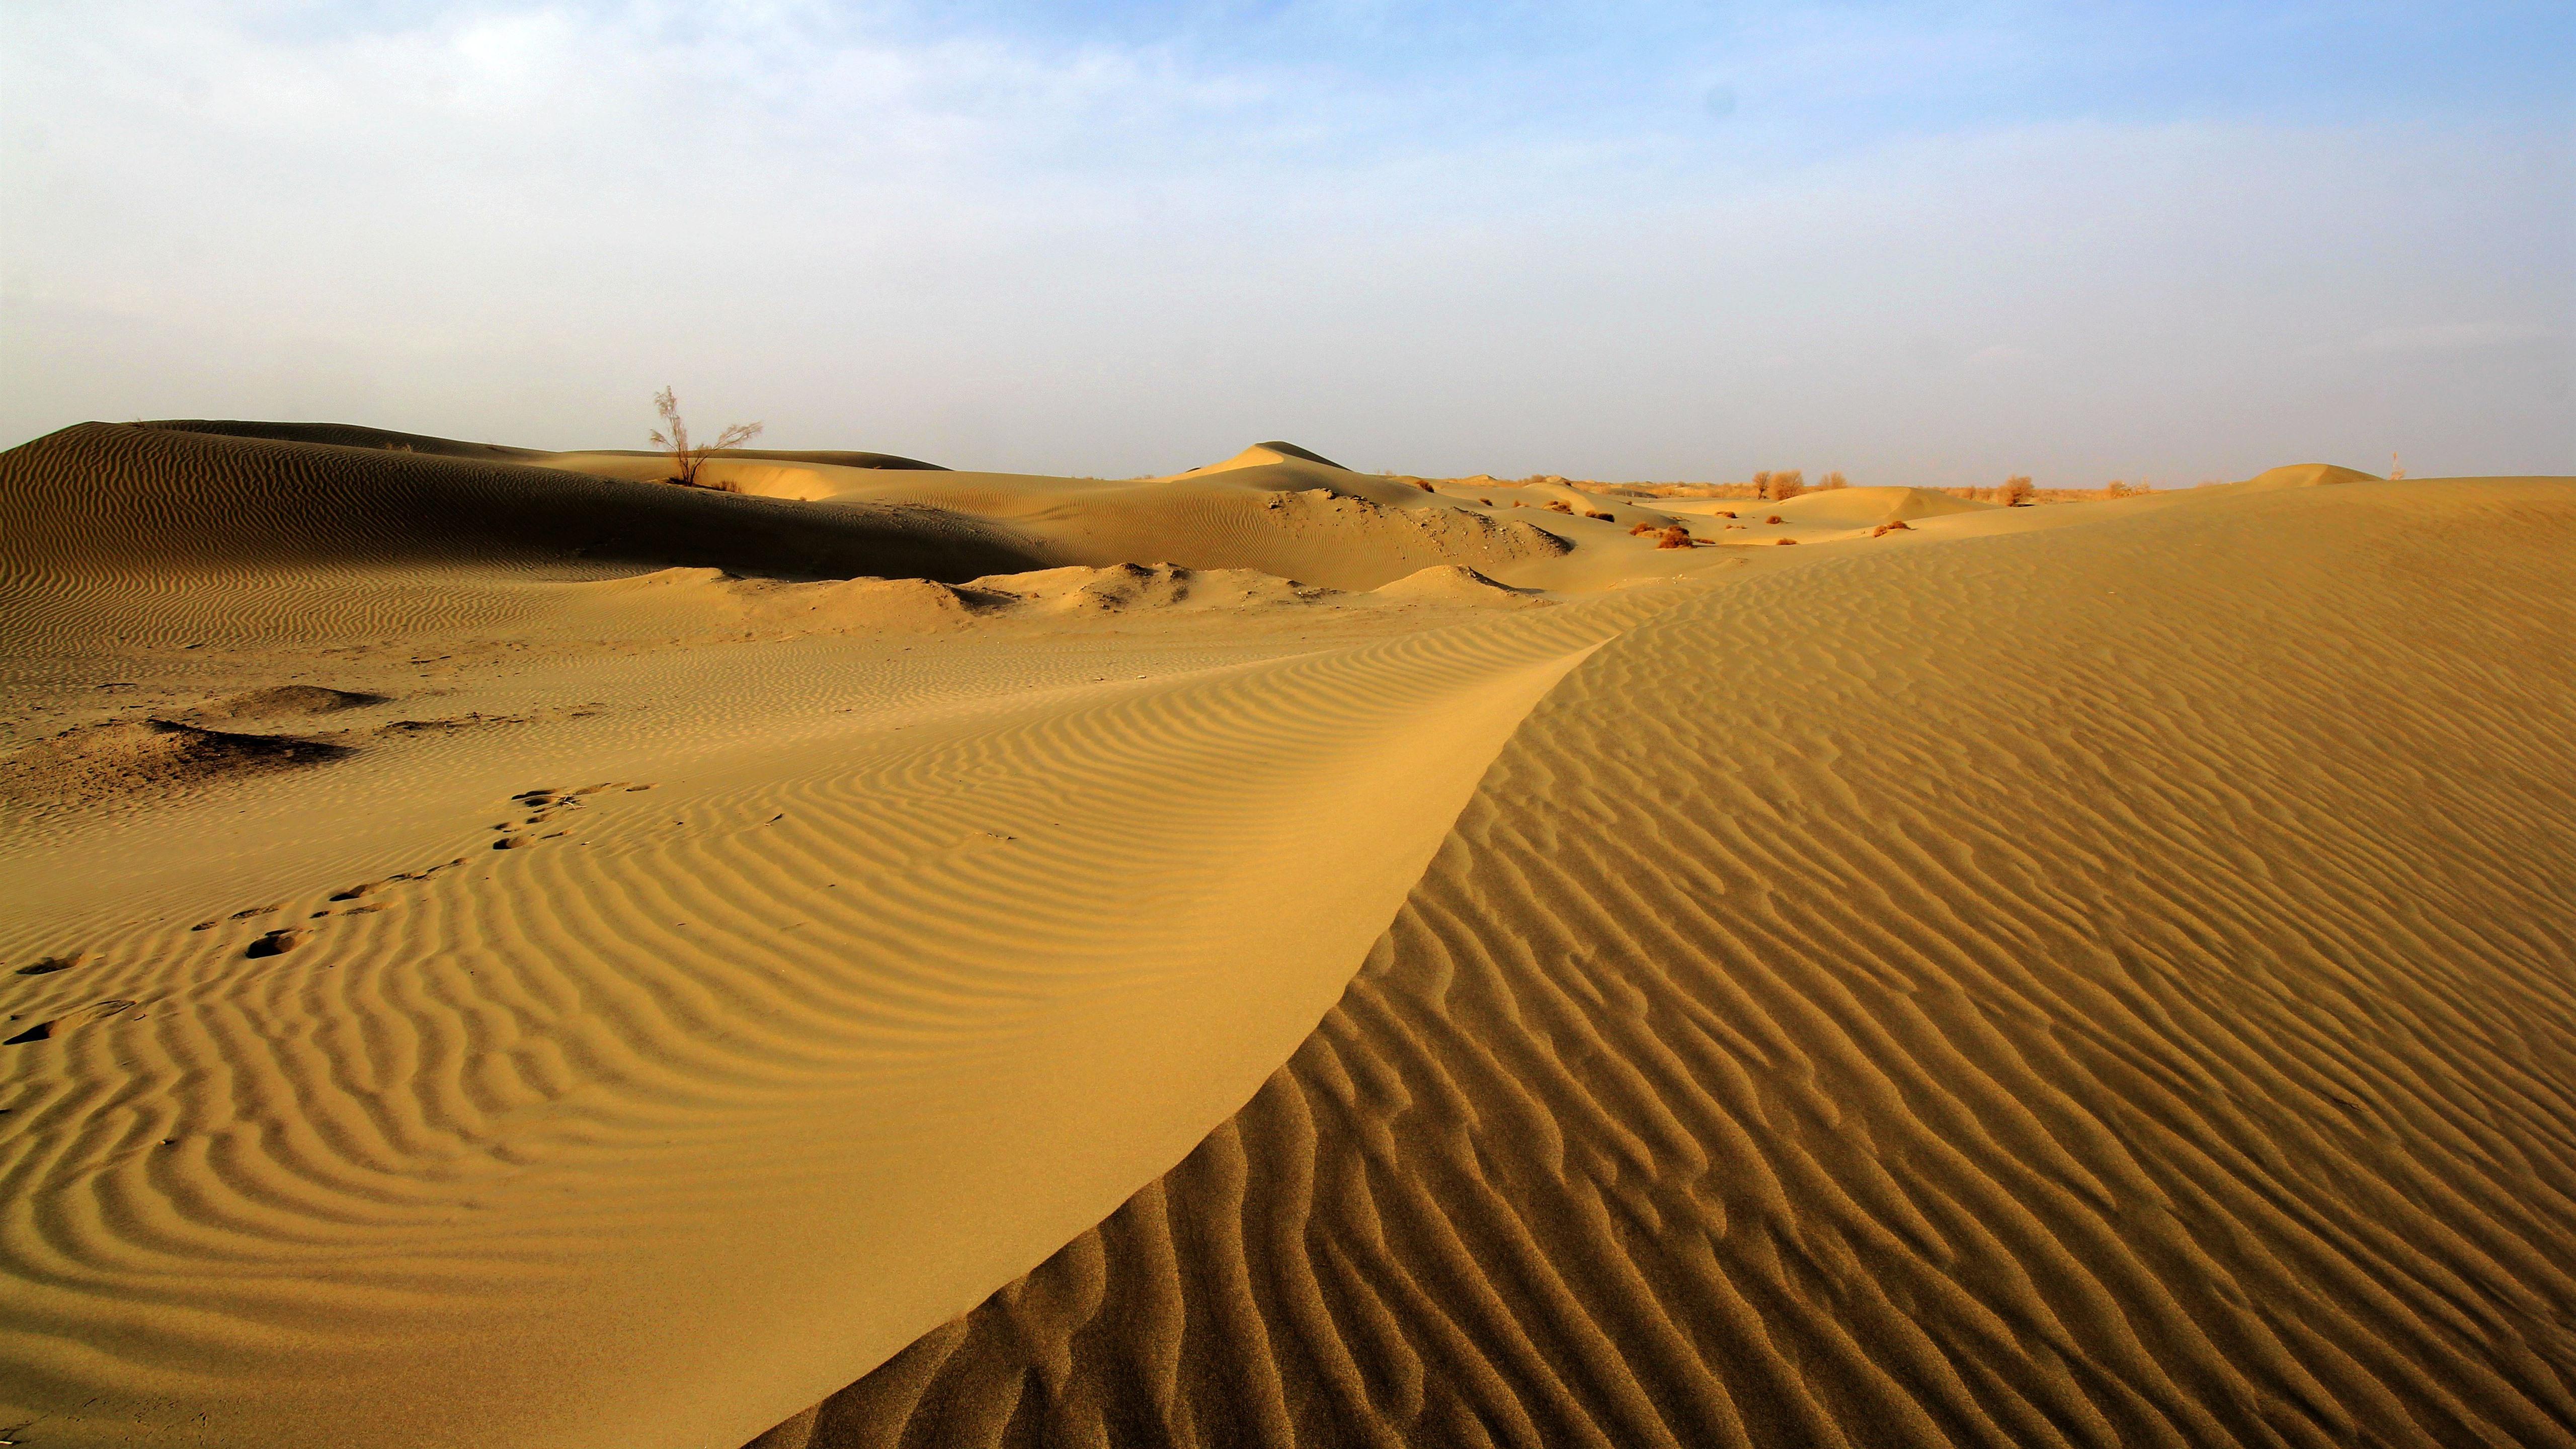 Wallpaper Taklamakan Desert Dune 5120x2880 UHD 5K Picture Image